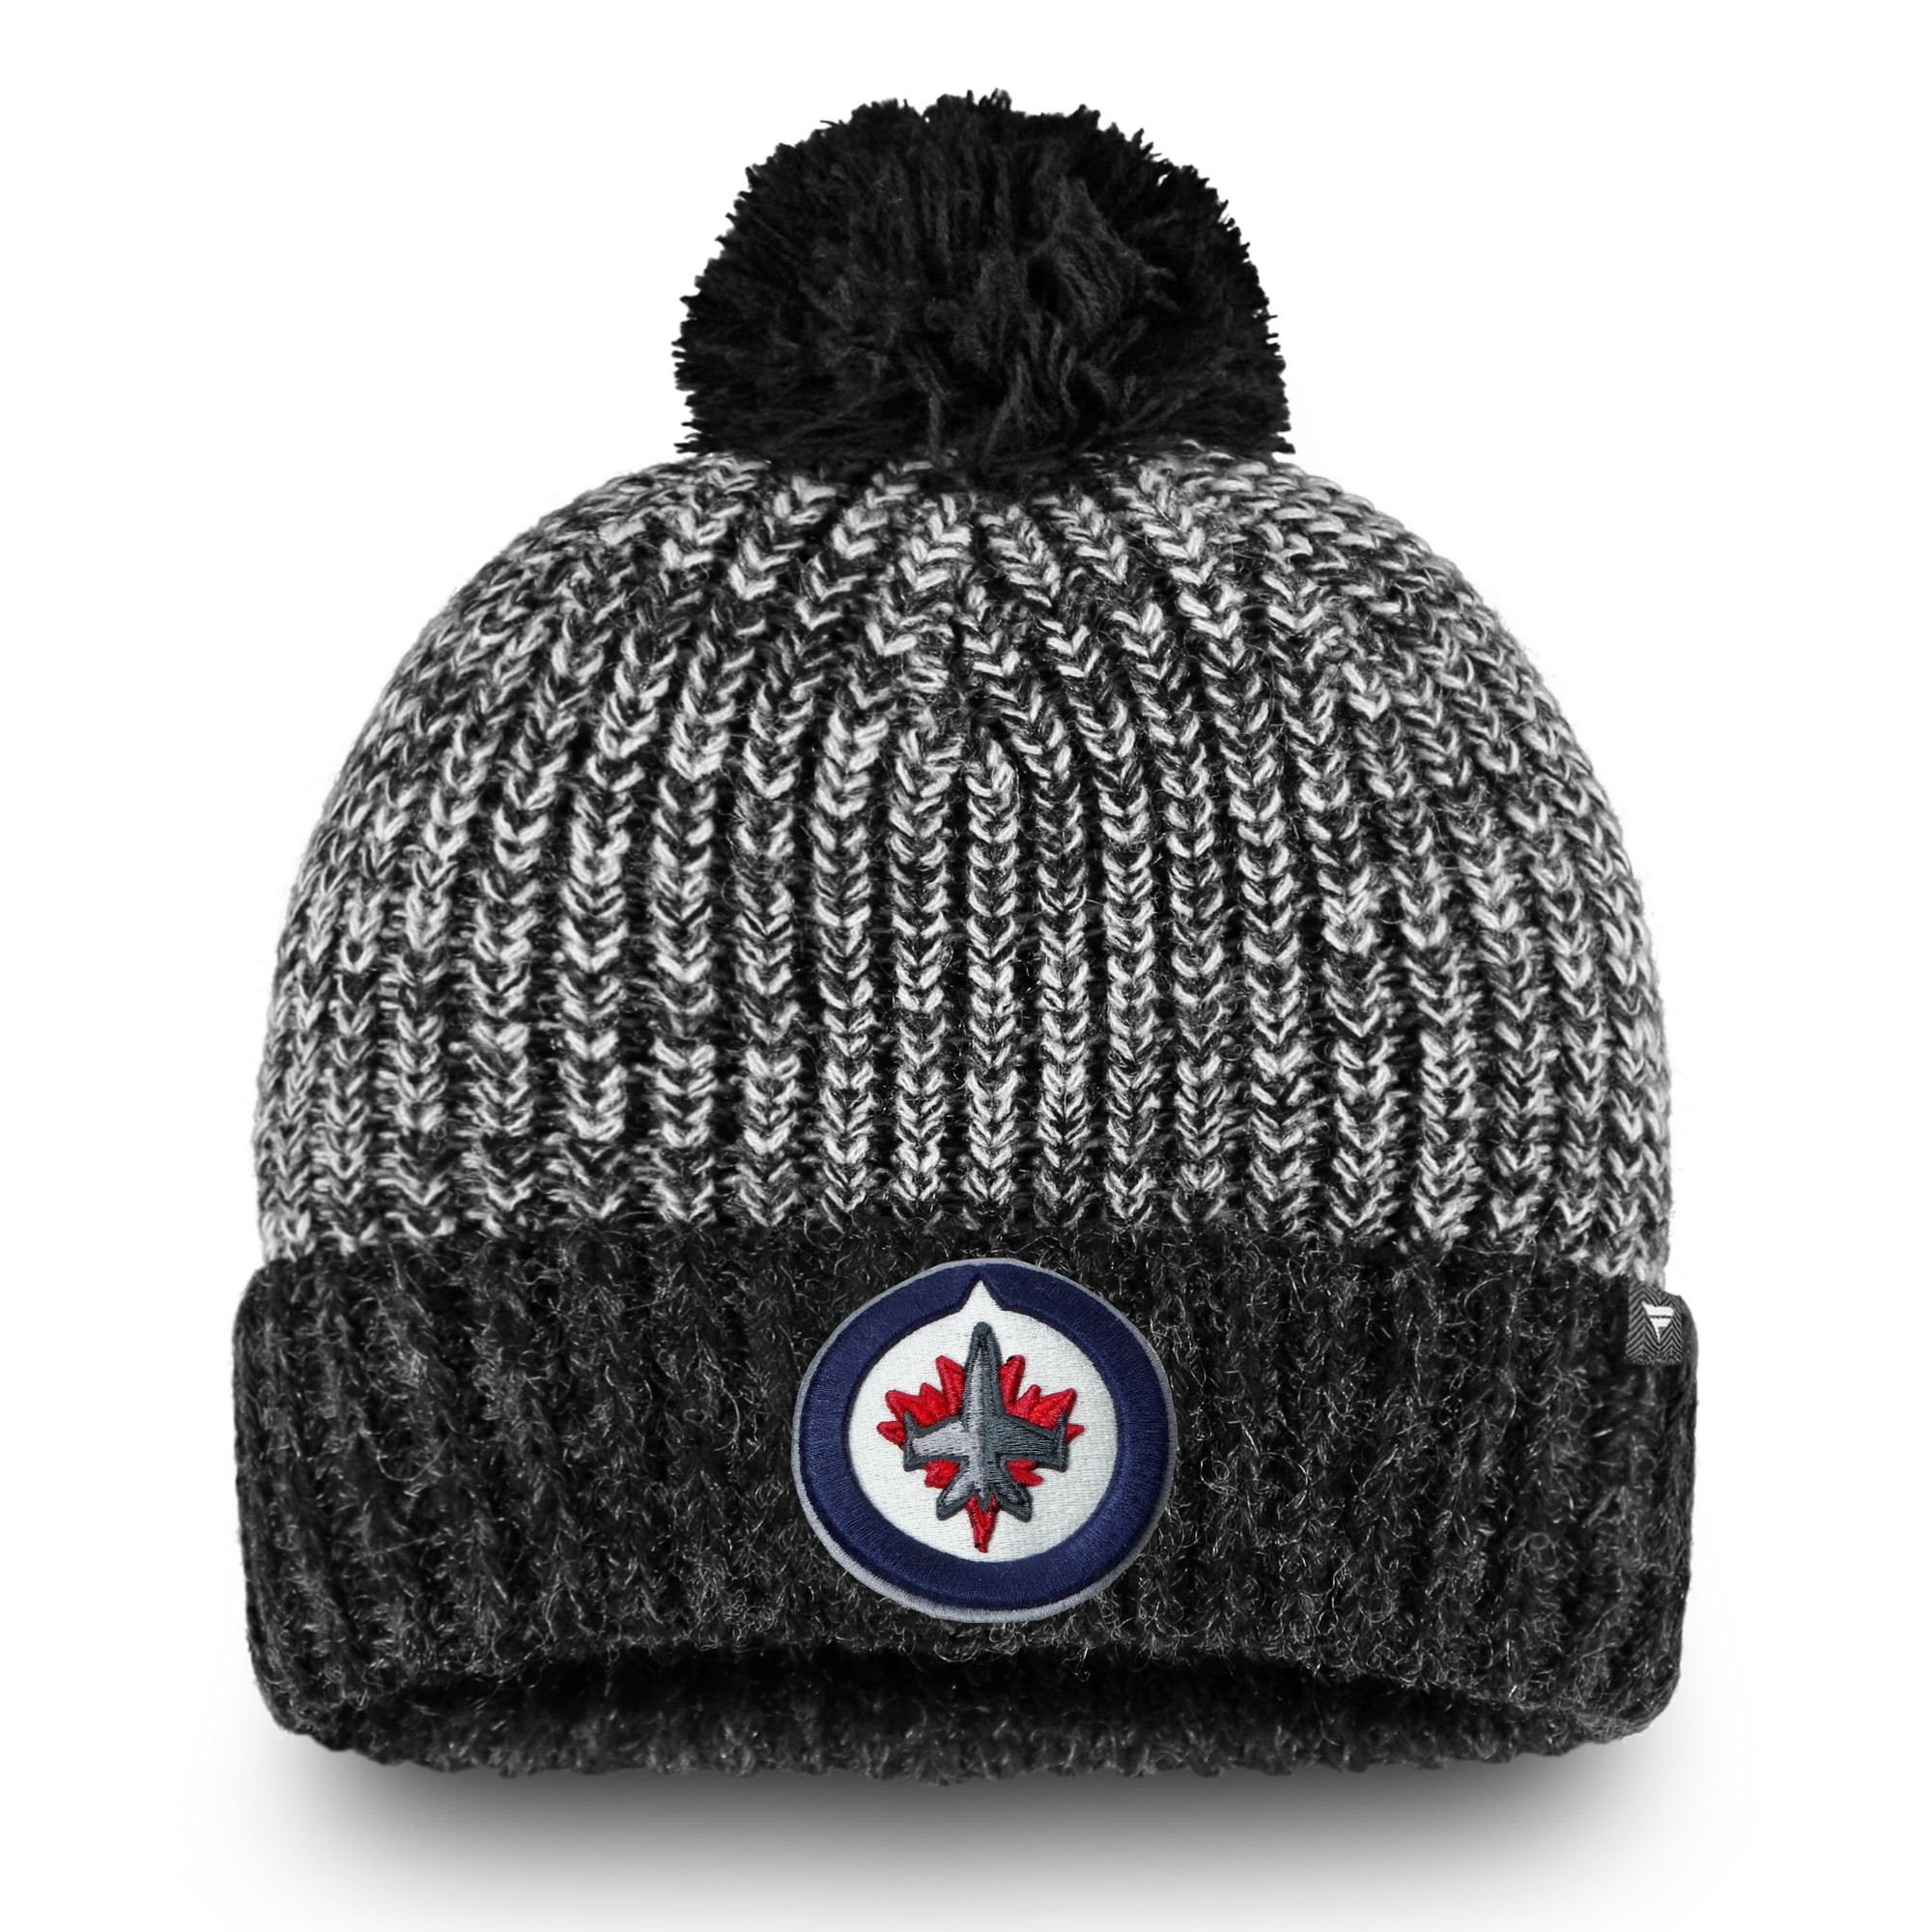 Winnipeg Jets Fanatics Branded Iconic Cuffed Knit Hat with Pom - Black/Gray - OSFA